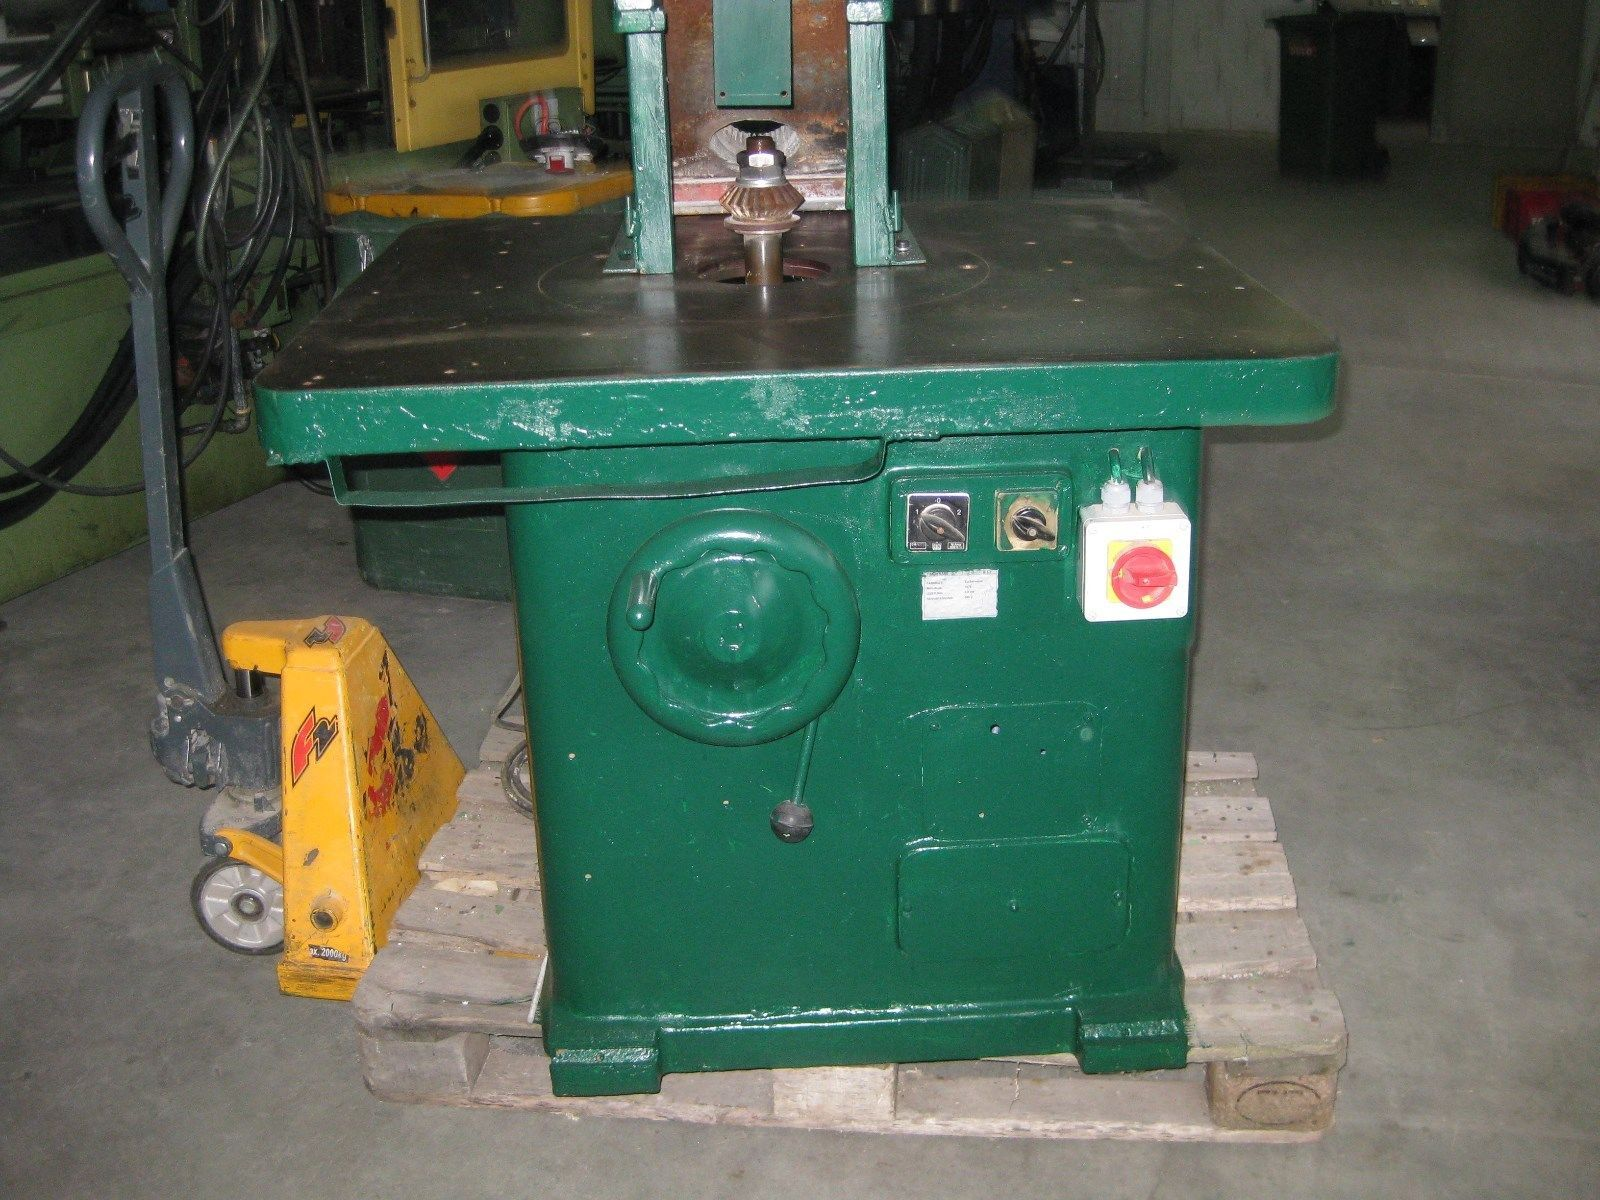 Tischfräse Starrspindelfräse Fräsmaschine Holzfräsmaschine